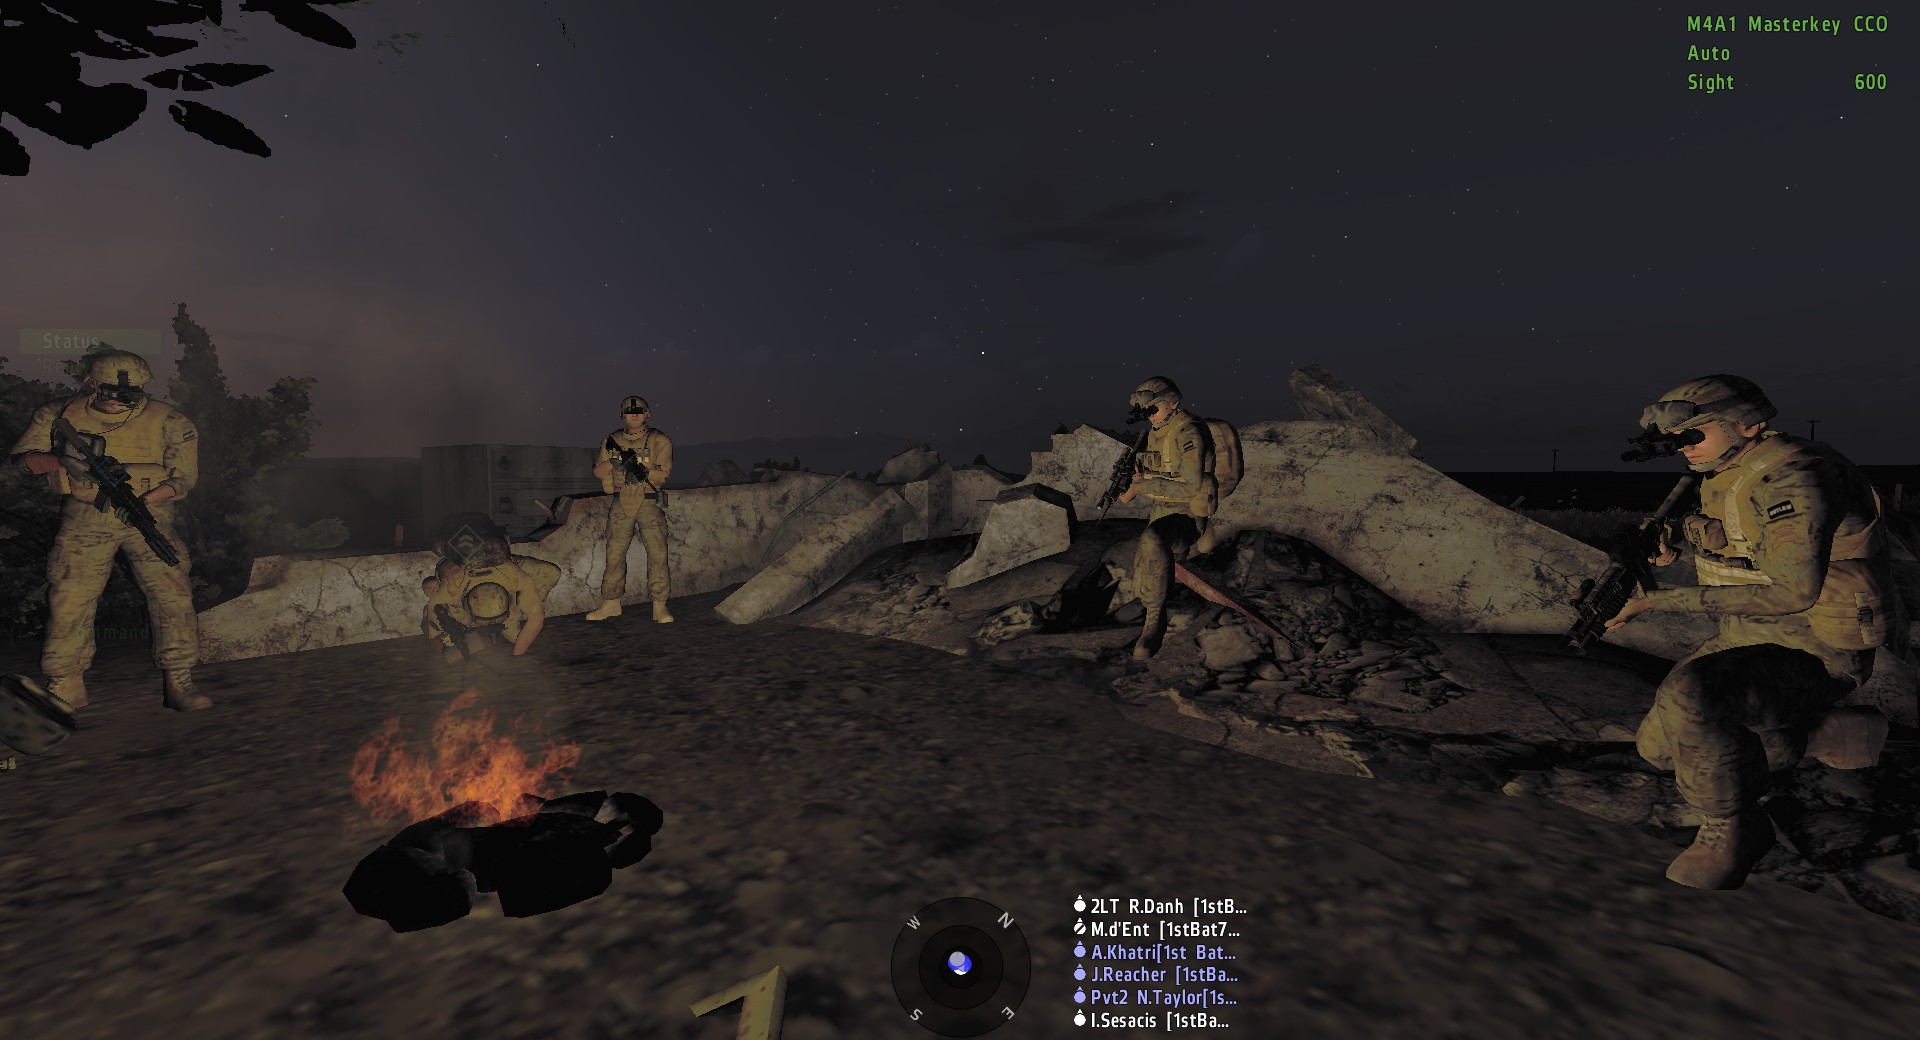 [Operation] Operation Shapur Take Over 3/11/17 [AAR] 3BD9D0E032CF88BD5C32A31BB68ED1D2E4149274